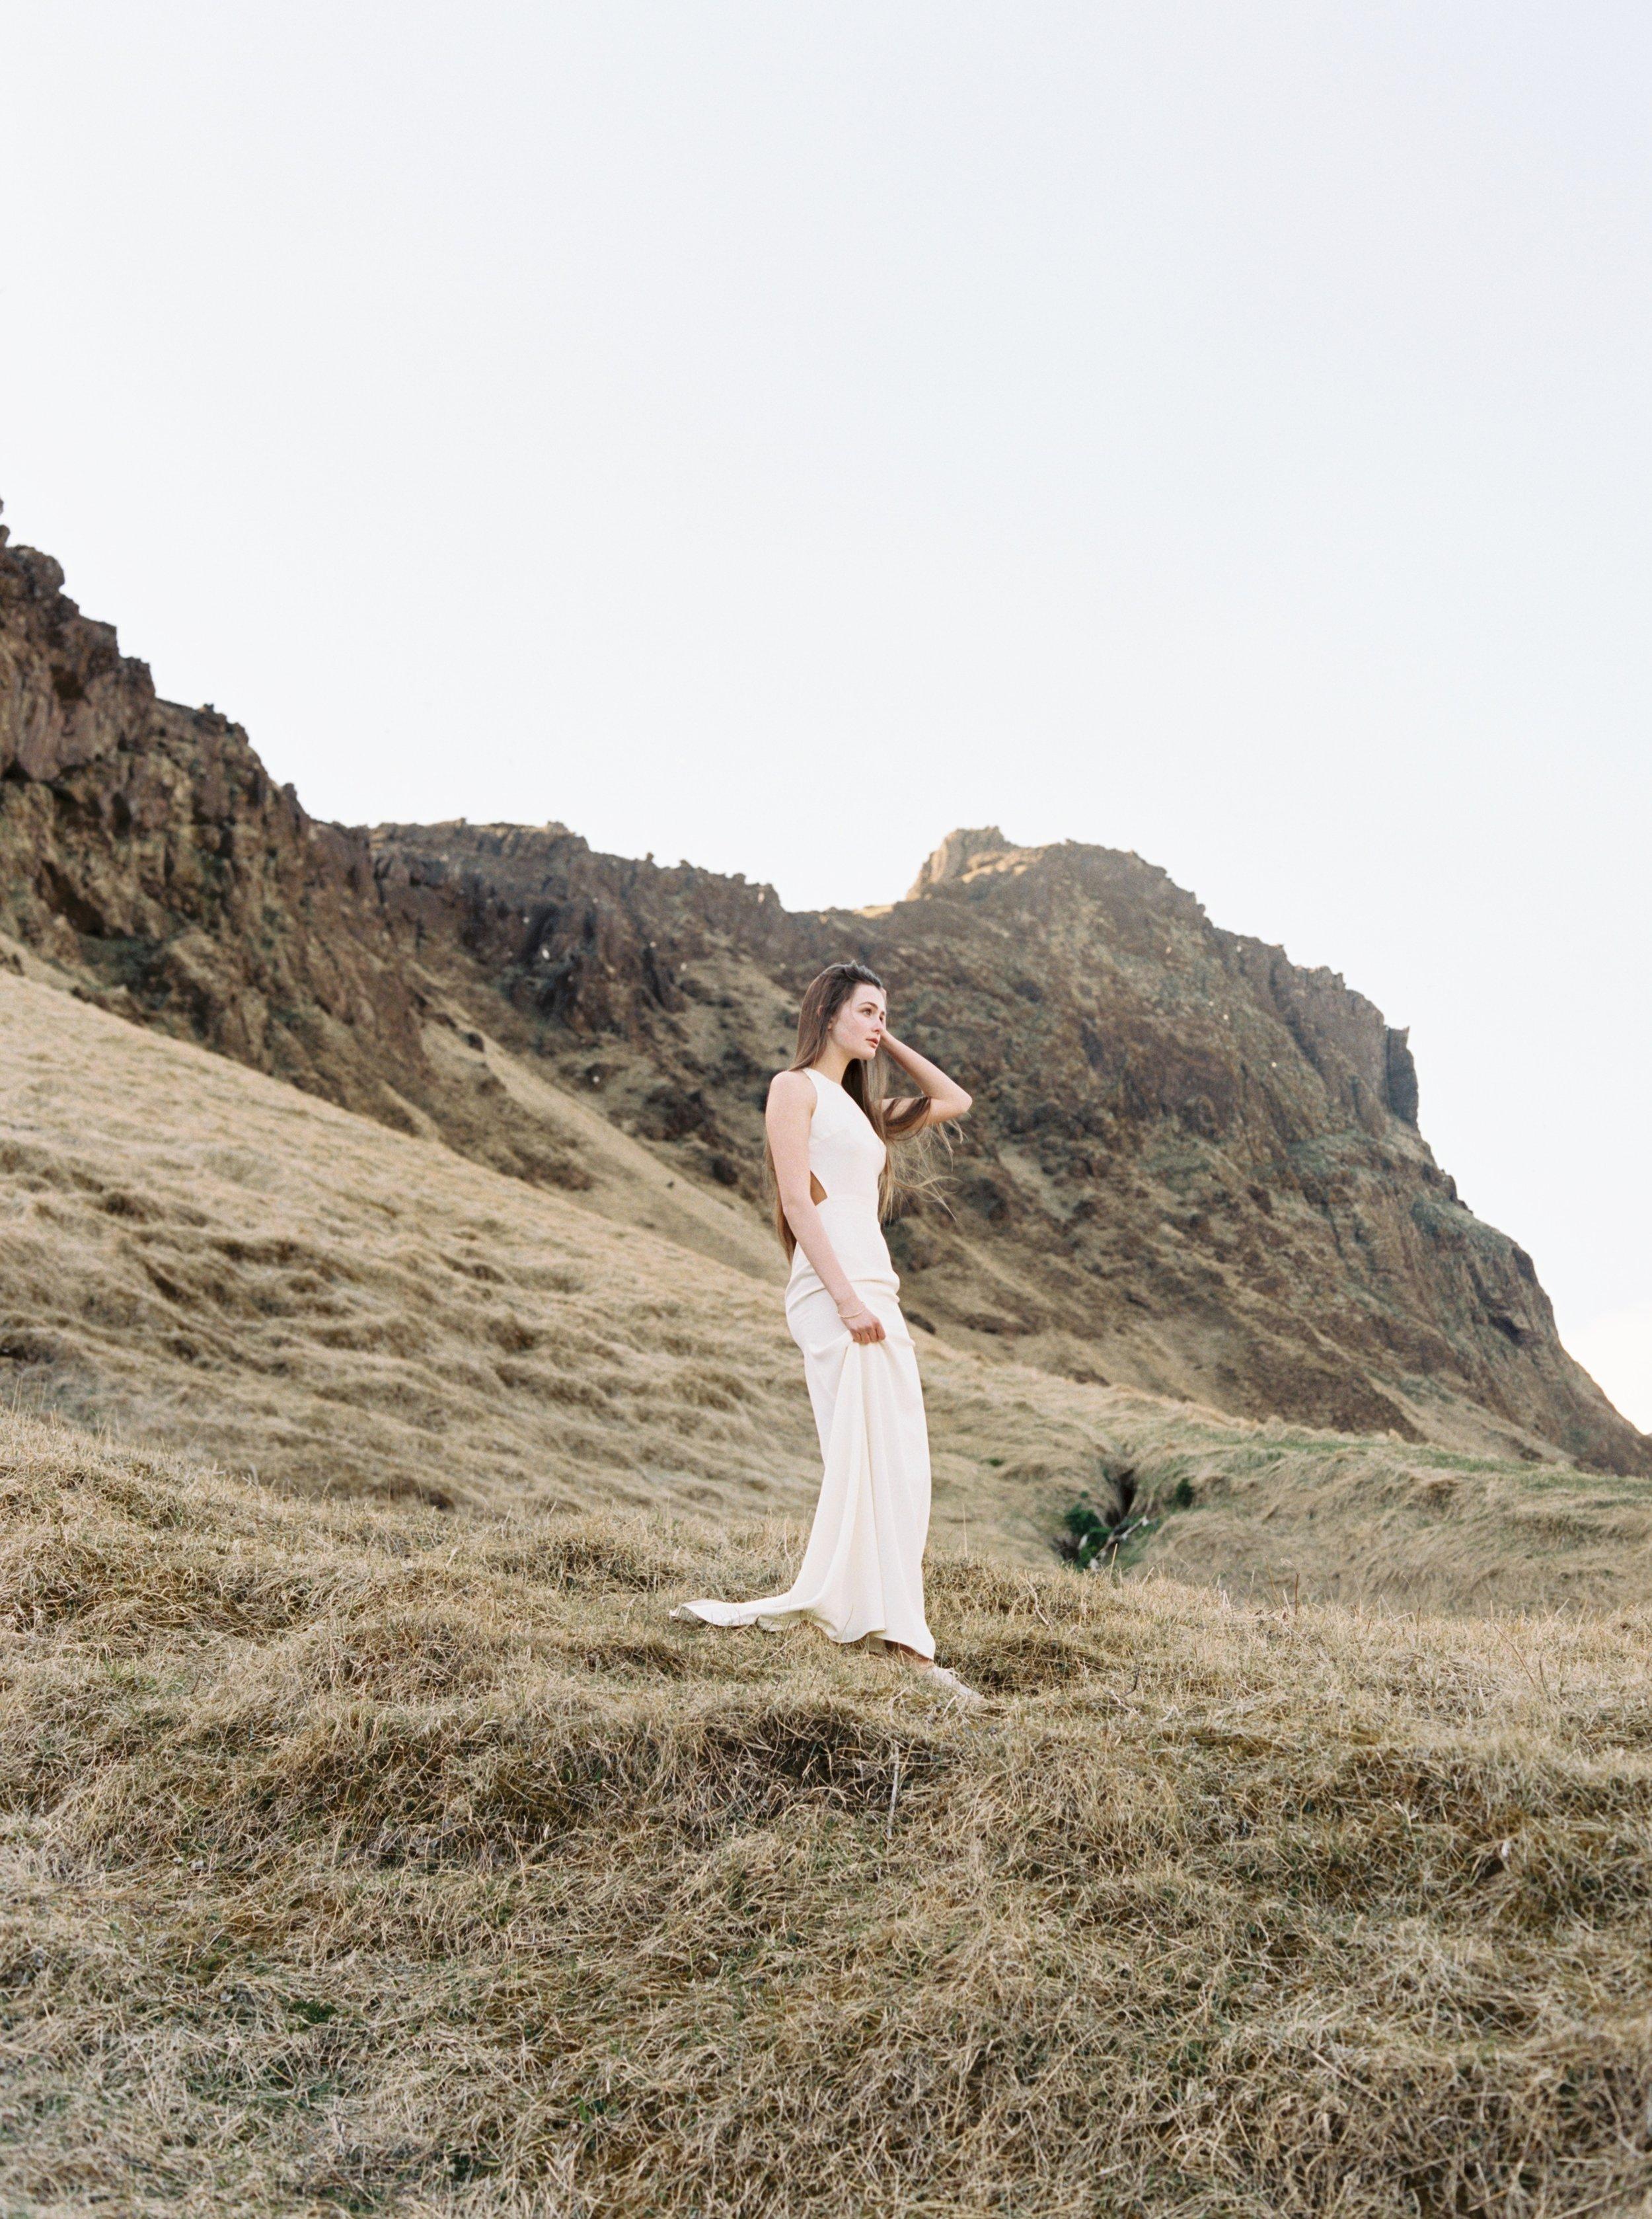 Kyle John l Fine Art Wedding Photography l Chicago, Copenhagen, California, New York, Destination l Blog l Part Four_Iceland_10